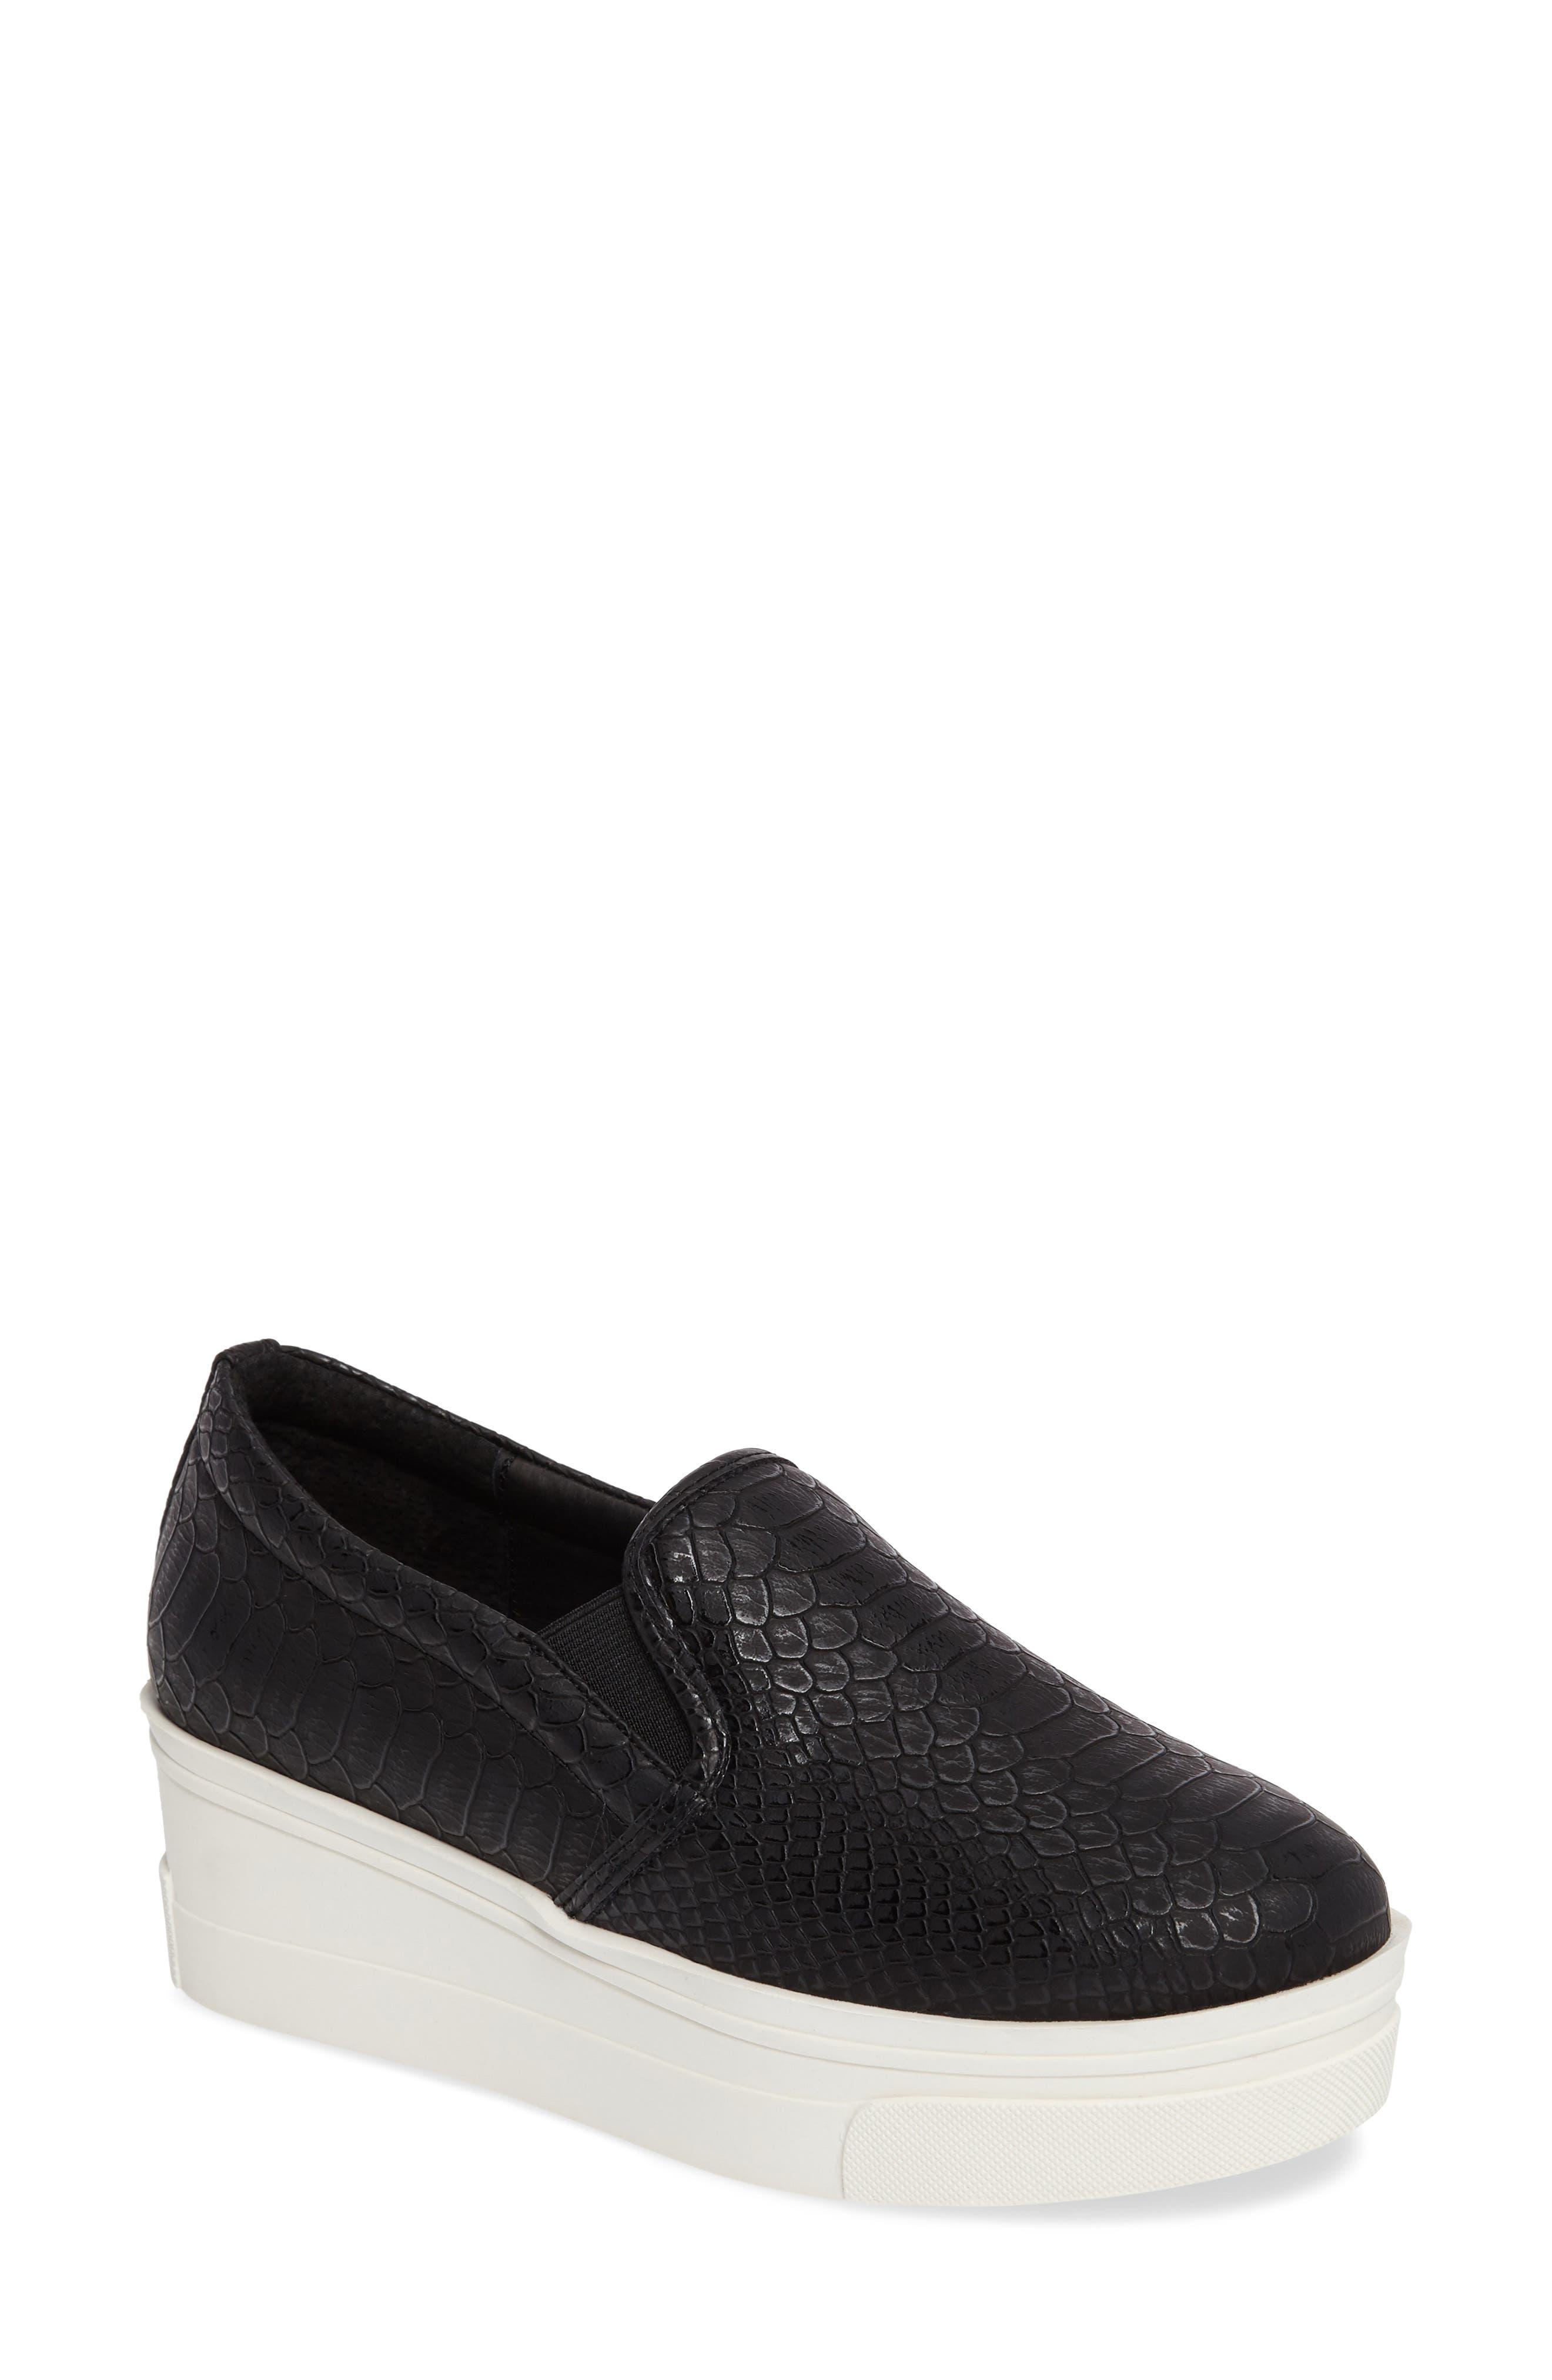 Alternate Image 1 Selected - JSlides Genna Slip-On Sneaker (Women)